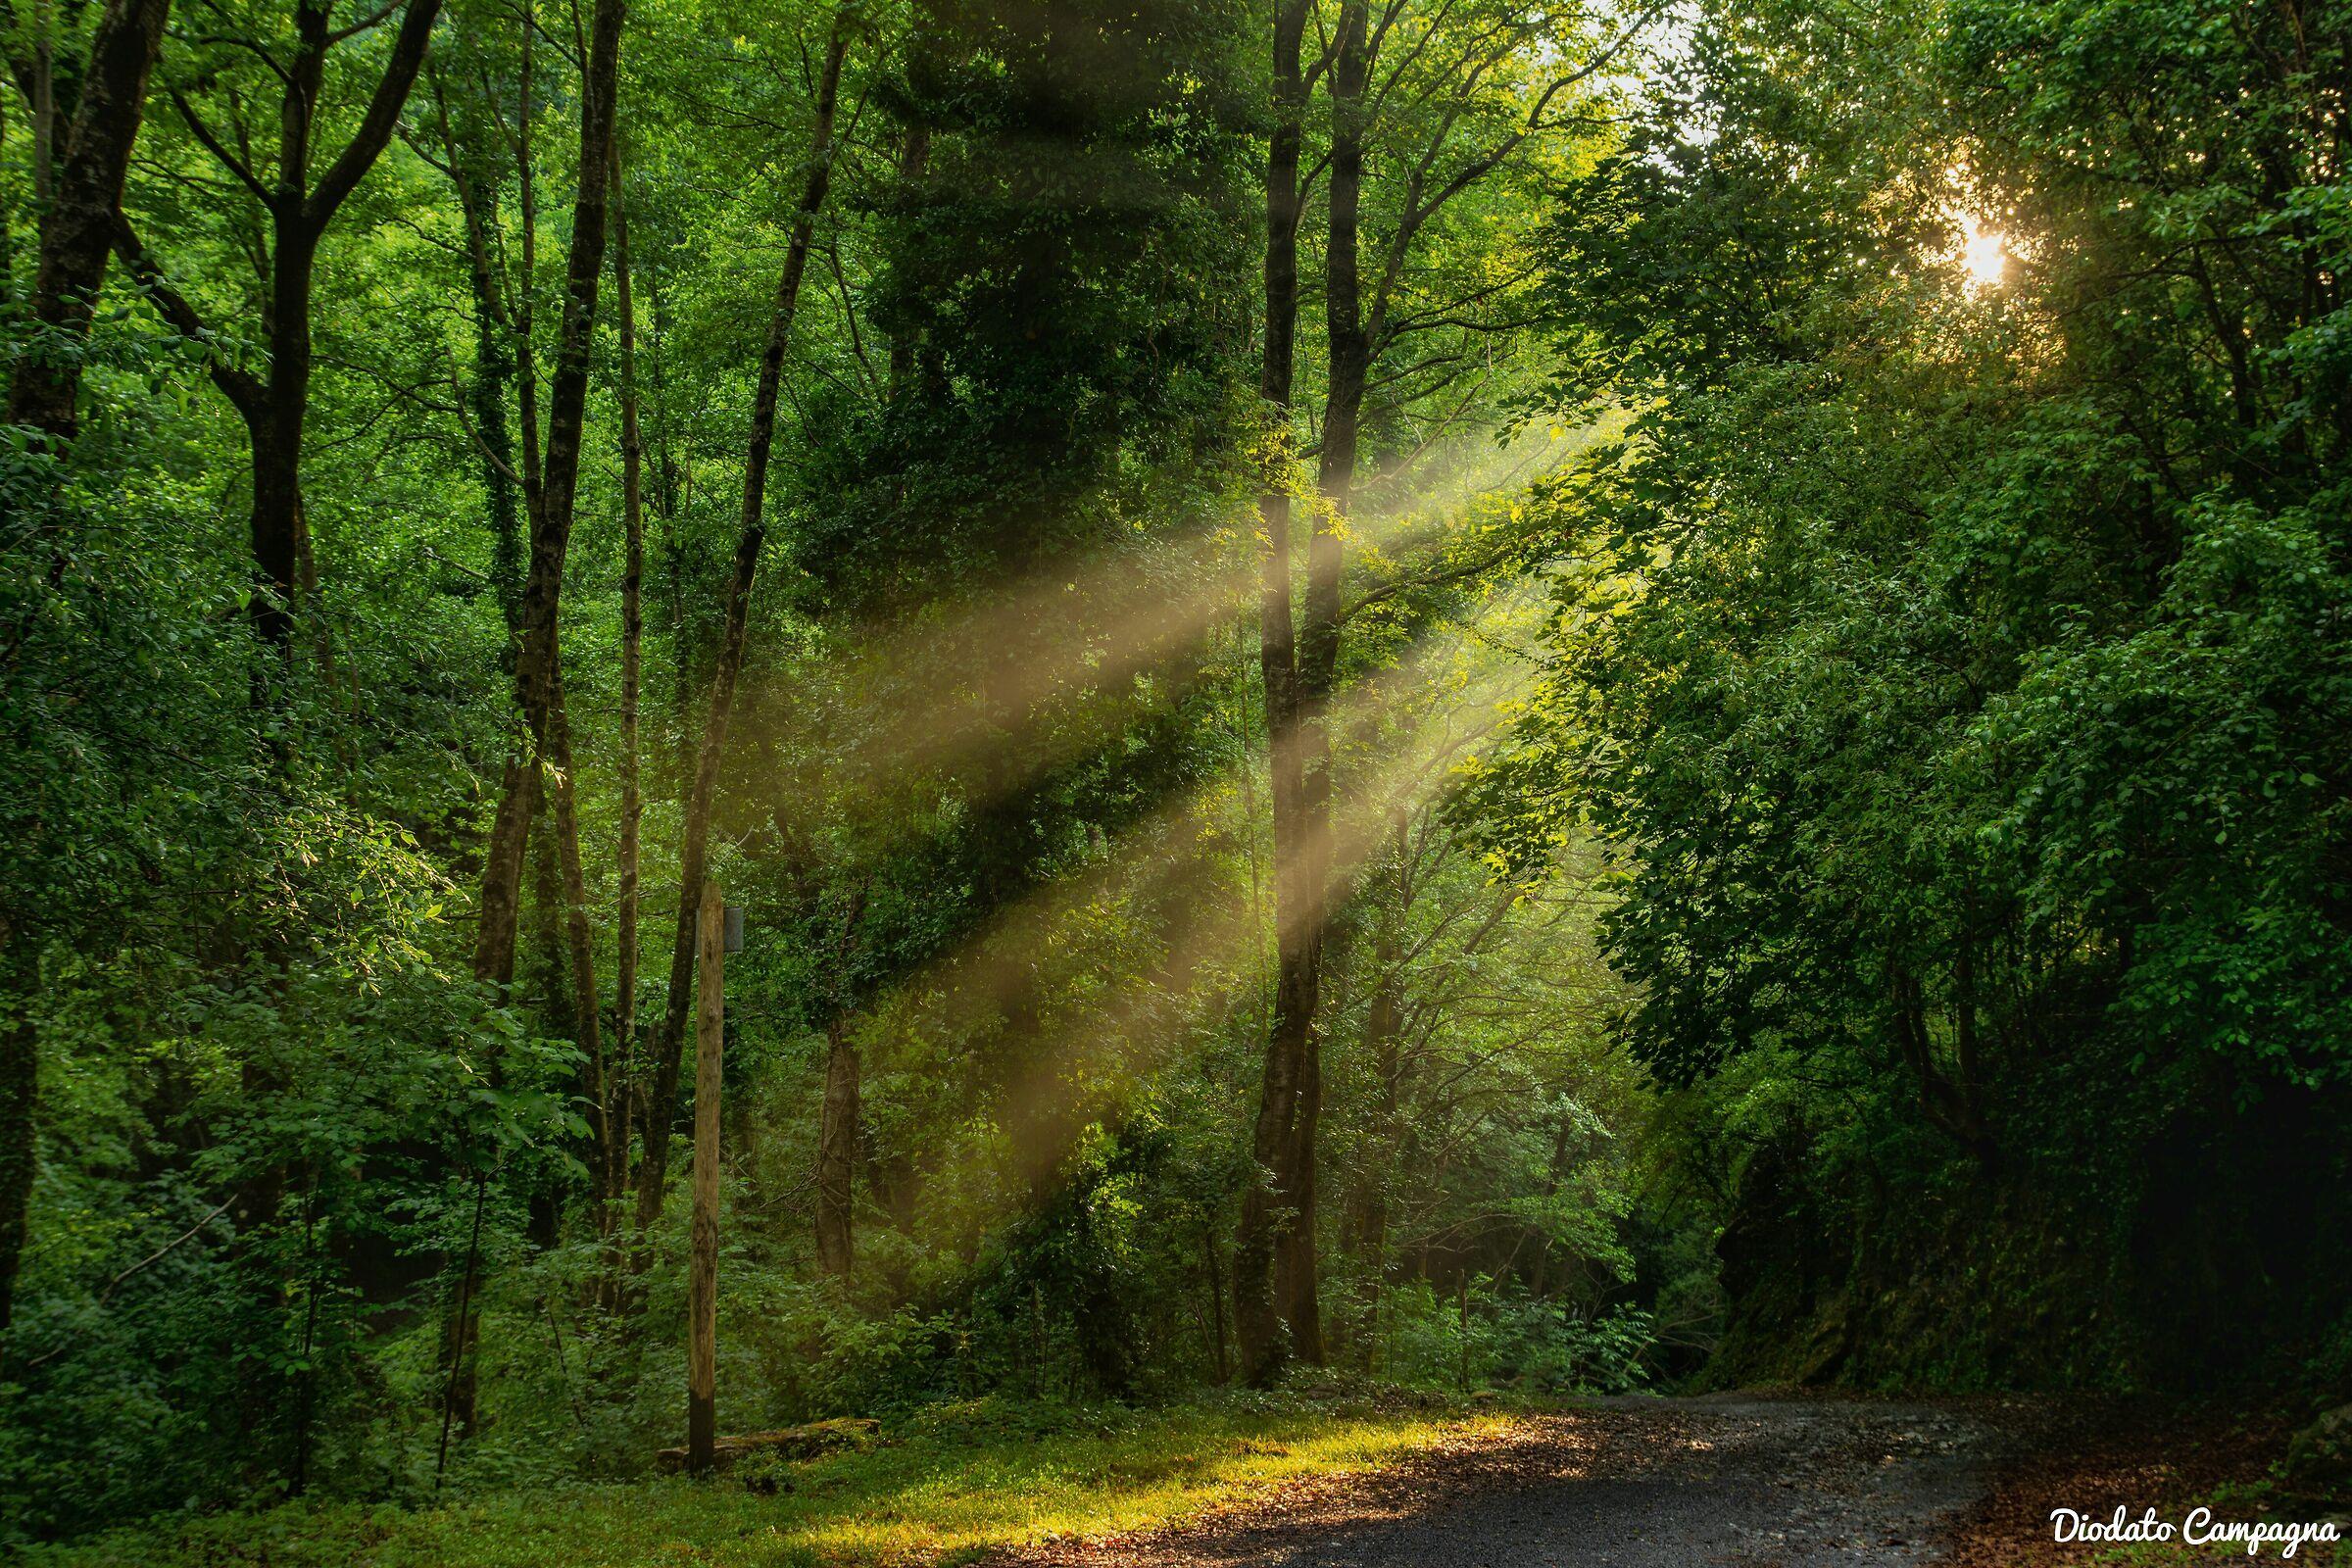 Sunbeams make their way through the trees...